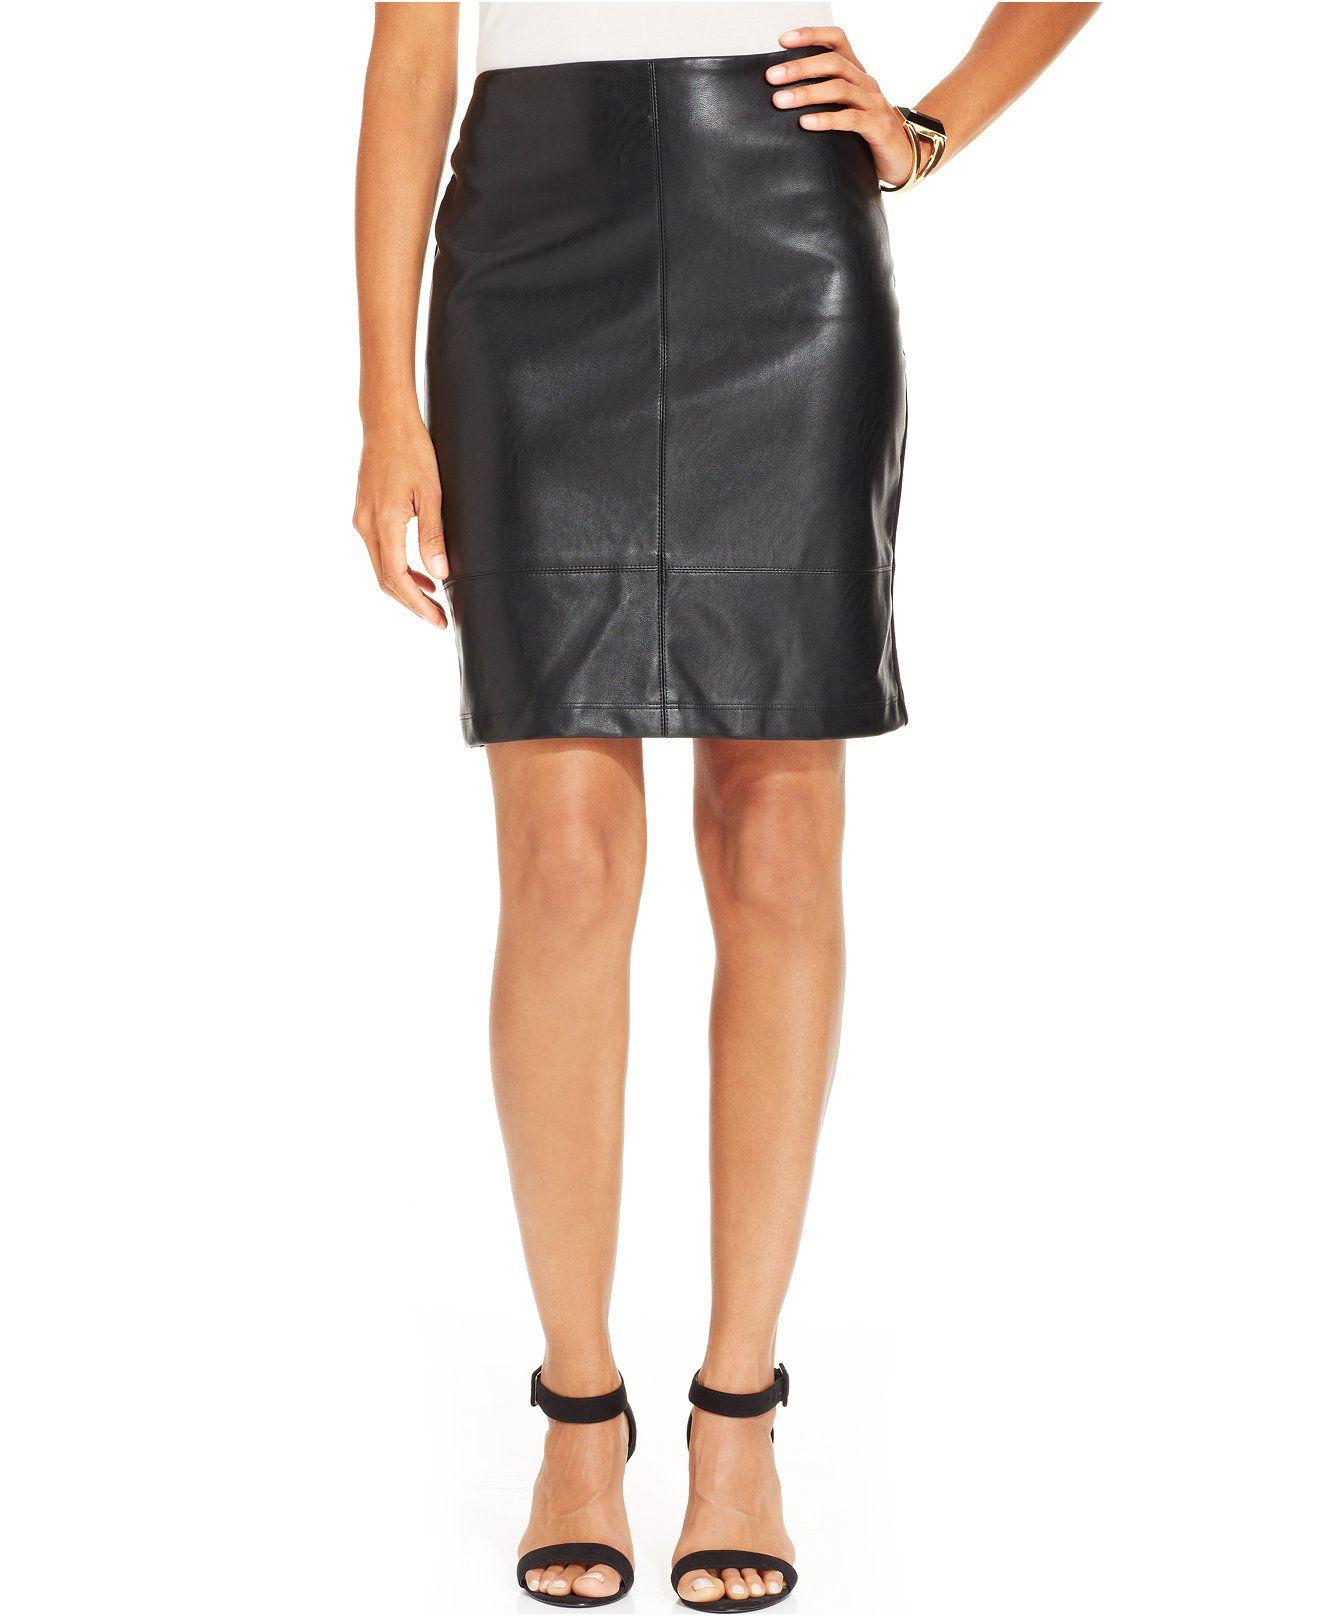 Karen Kane Black Faux Leather Mixed Media Pencil Skirt - Skirts - Women - Macy's #Karen_Kane #Fashion #Macys